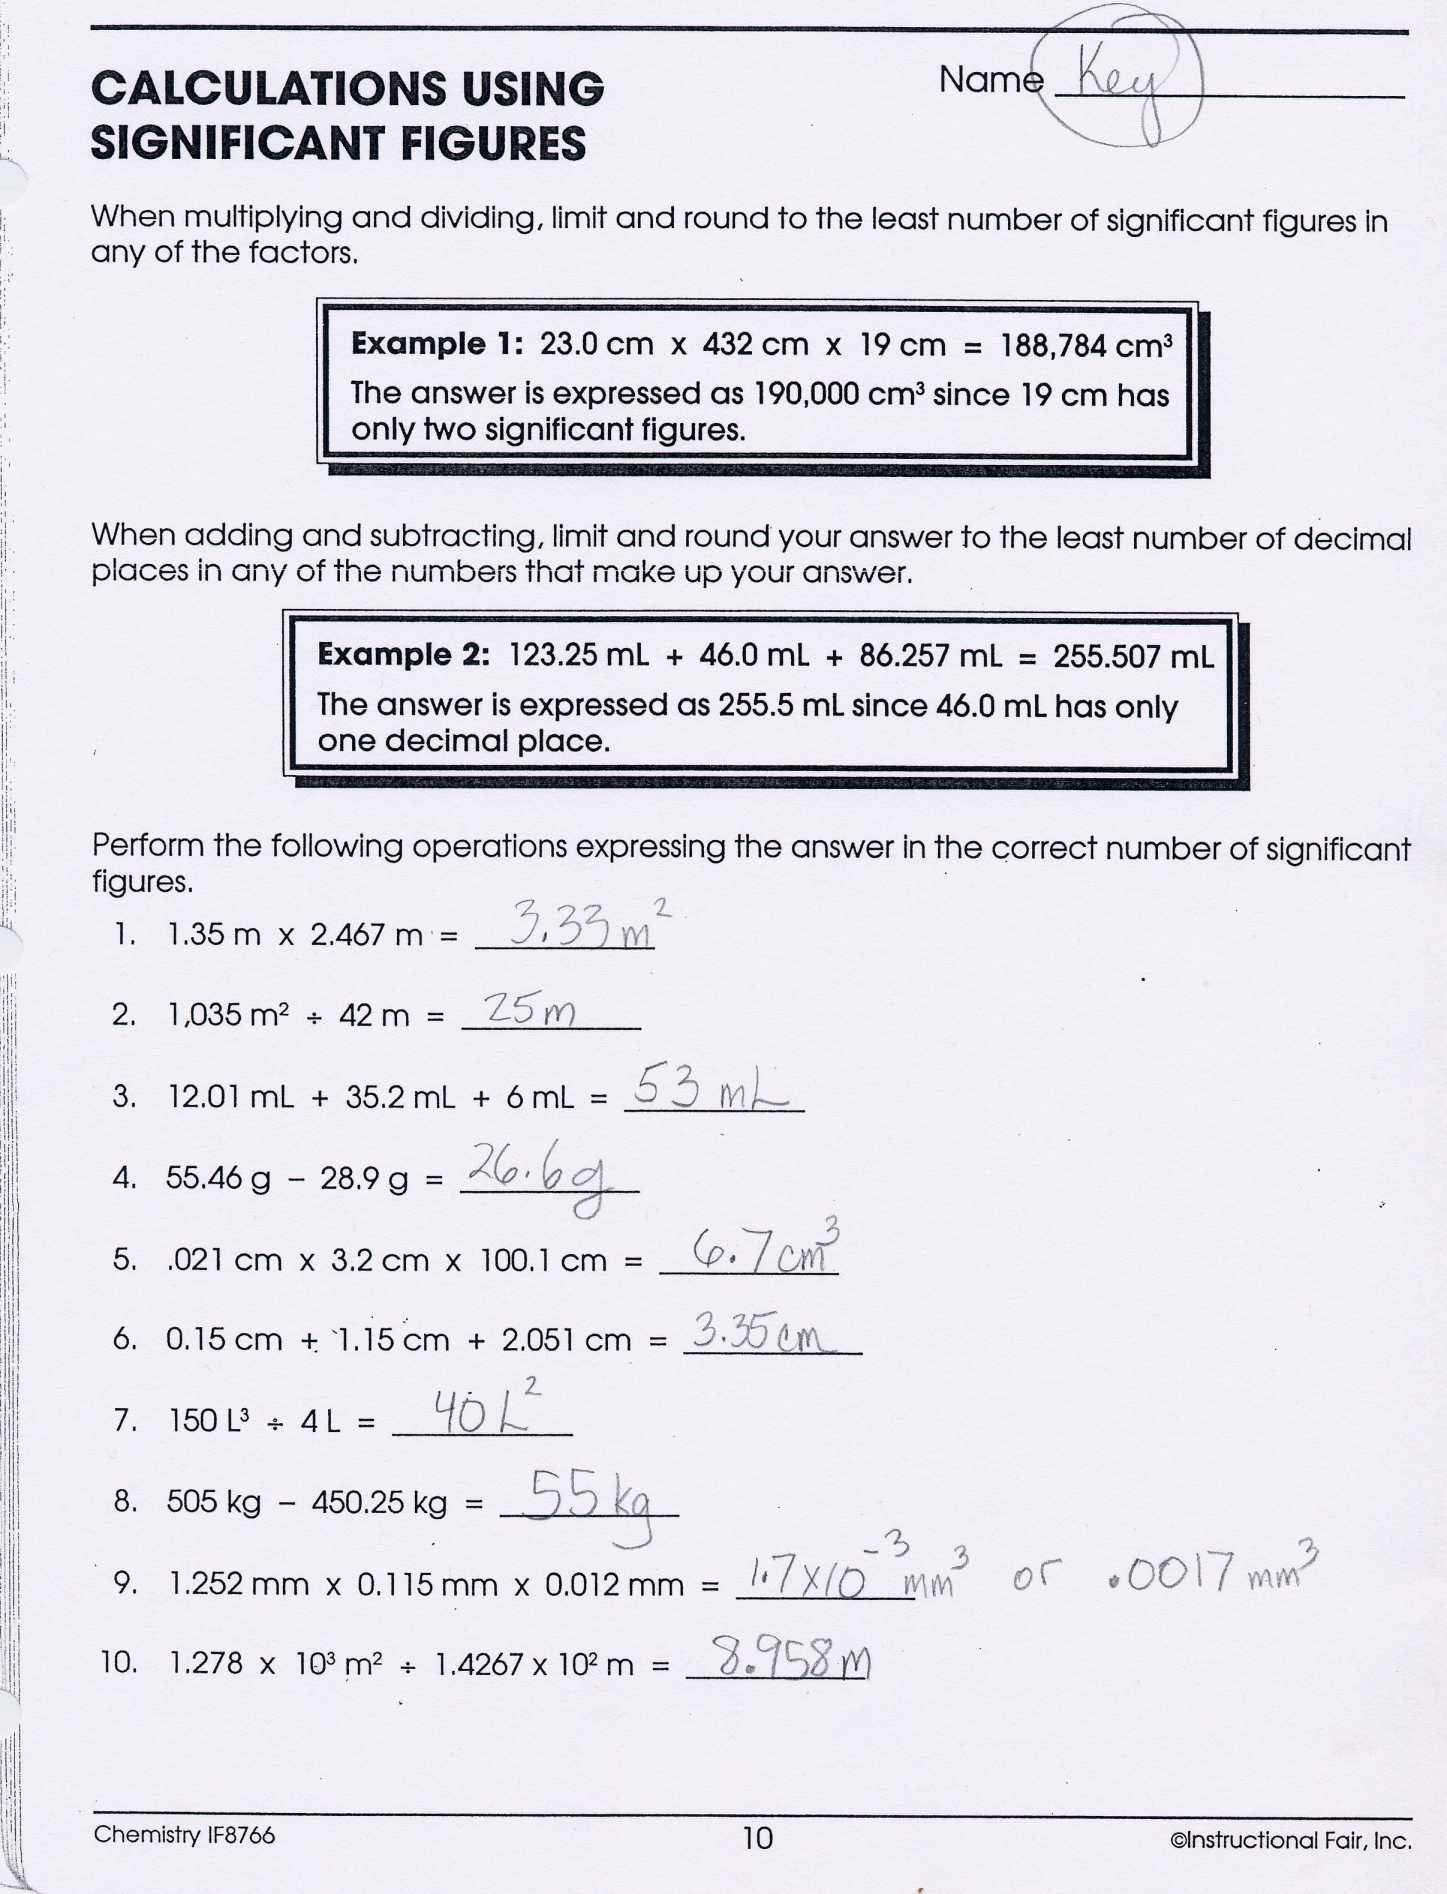 Electron Configuration Worksheet Answers Electron Configuration Worksheet Section 5 3